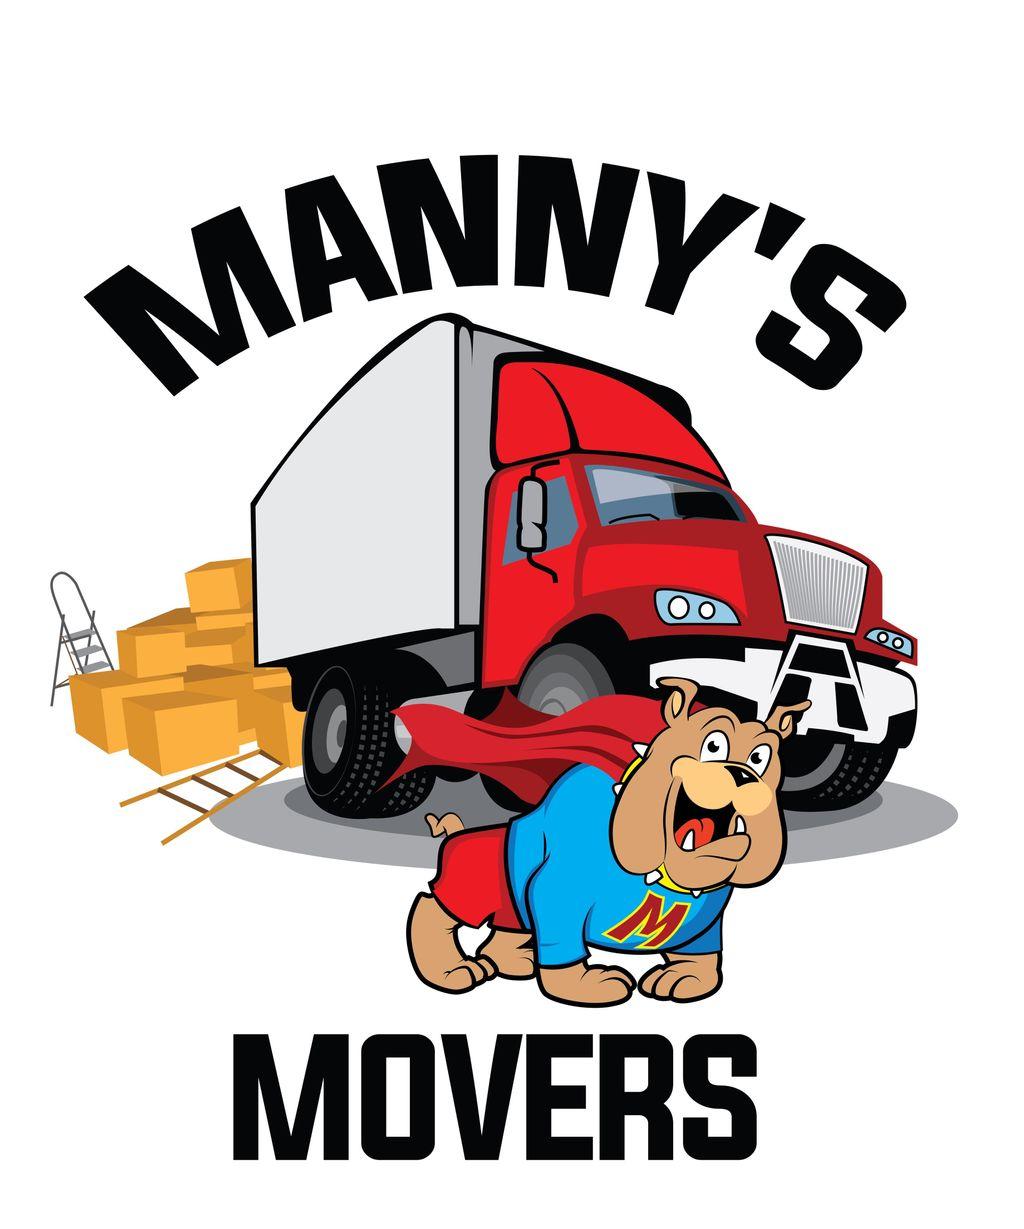 Manny's Movers & Van Lines